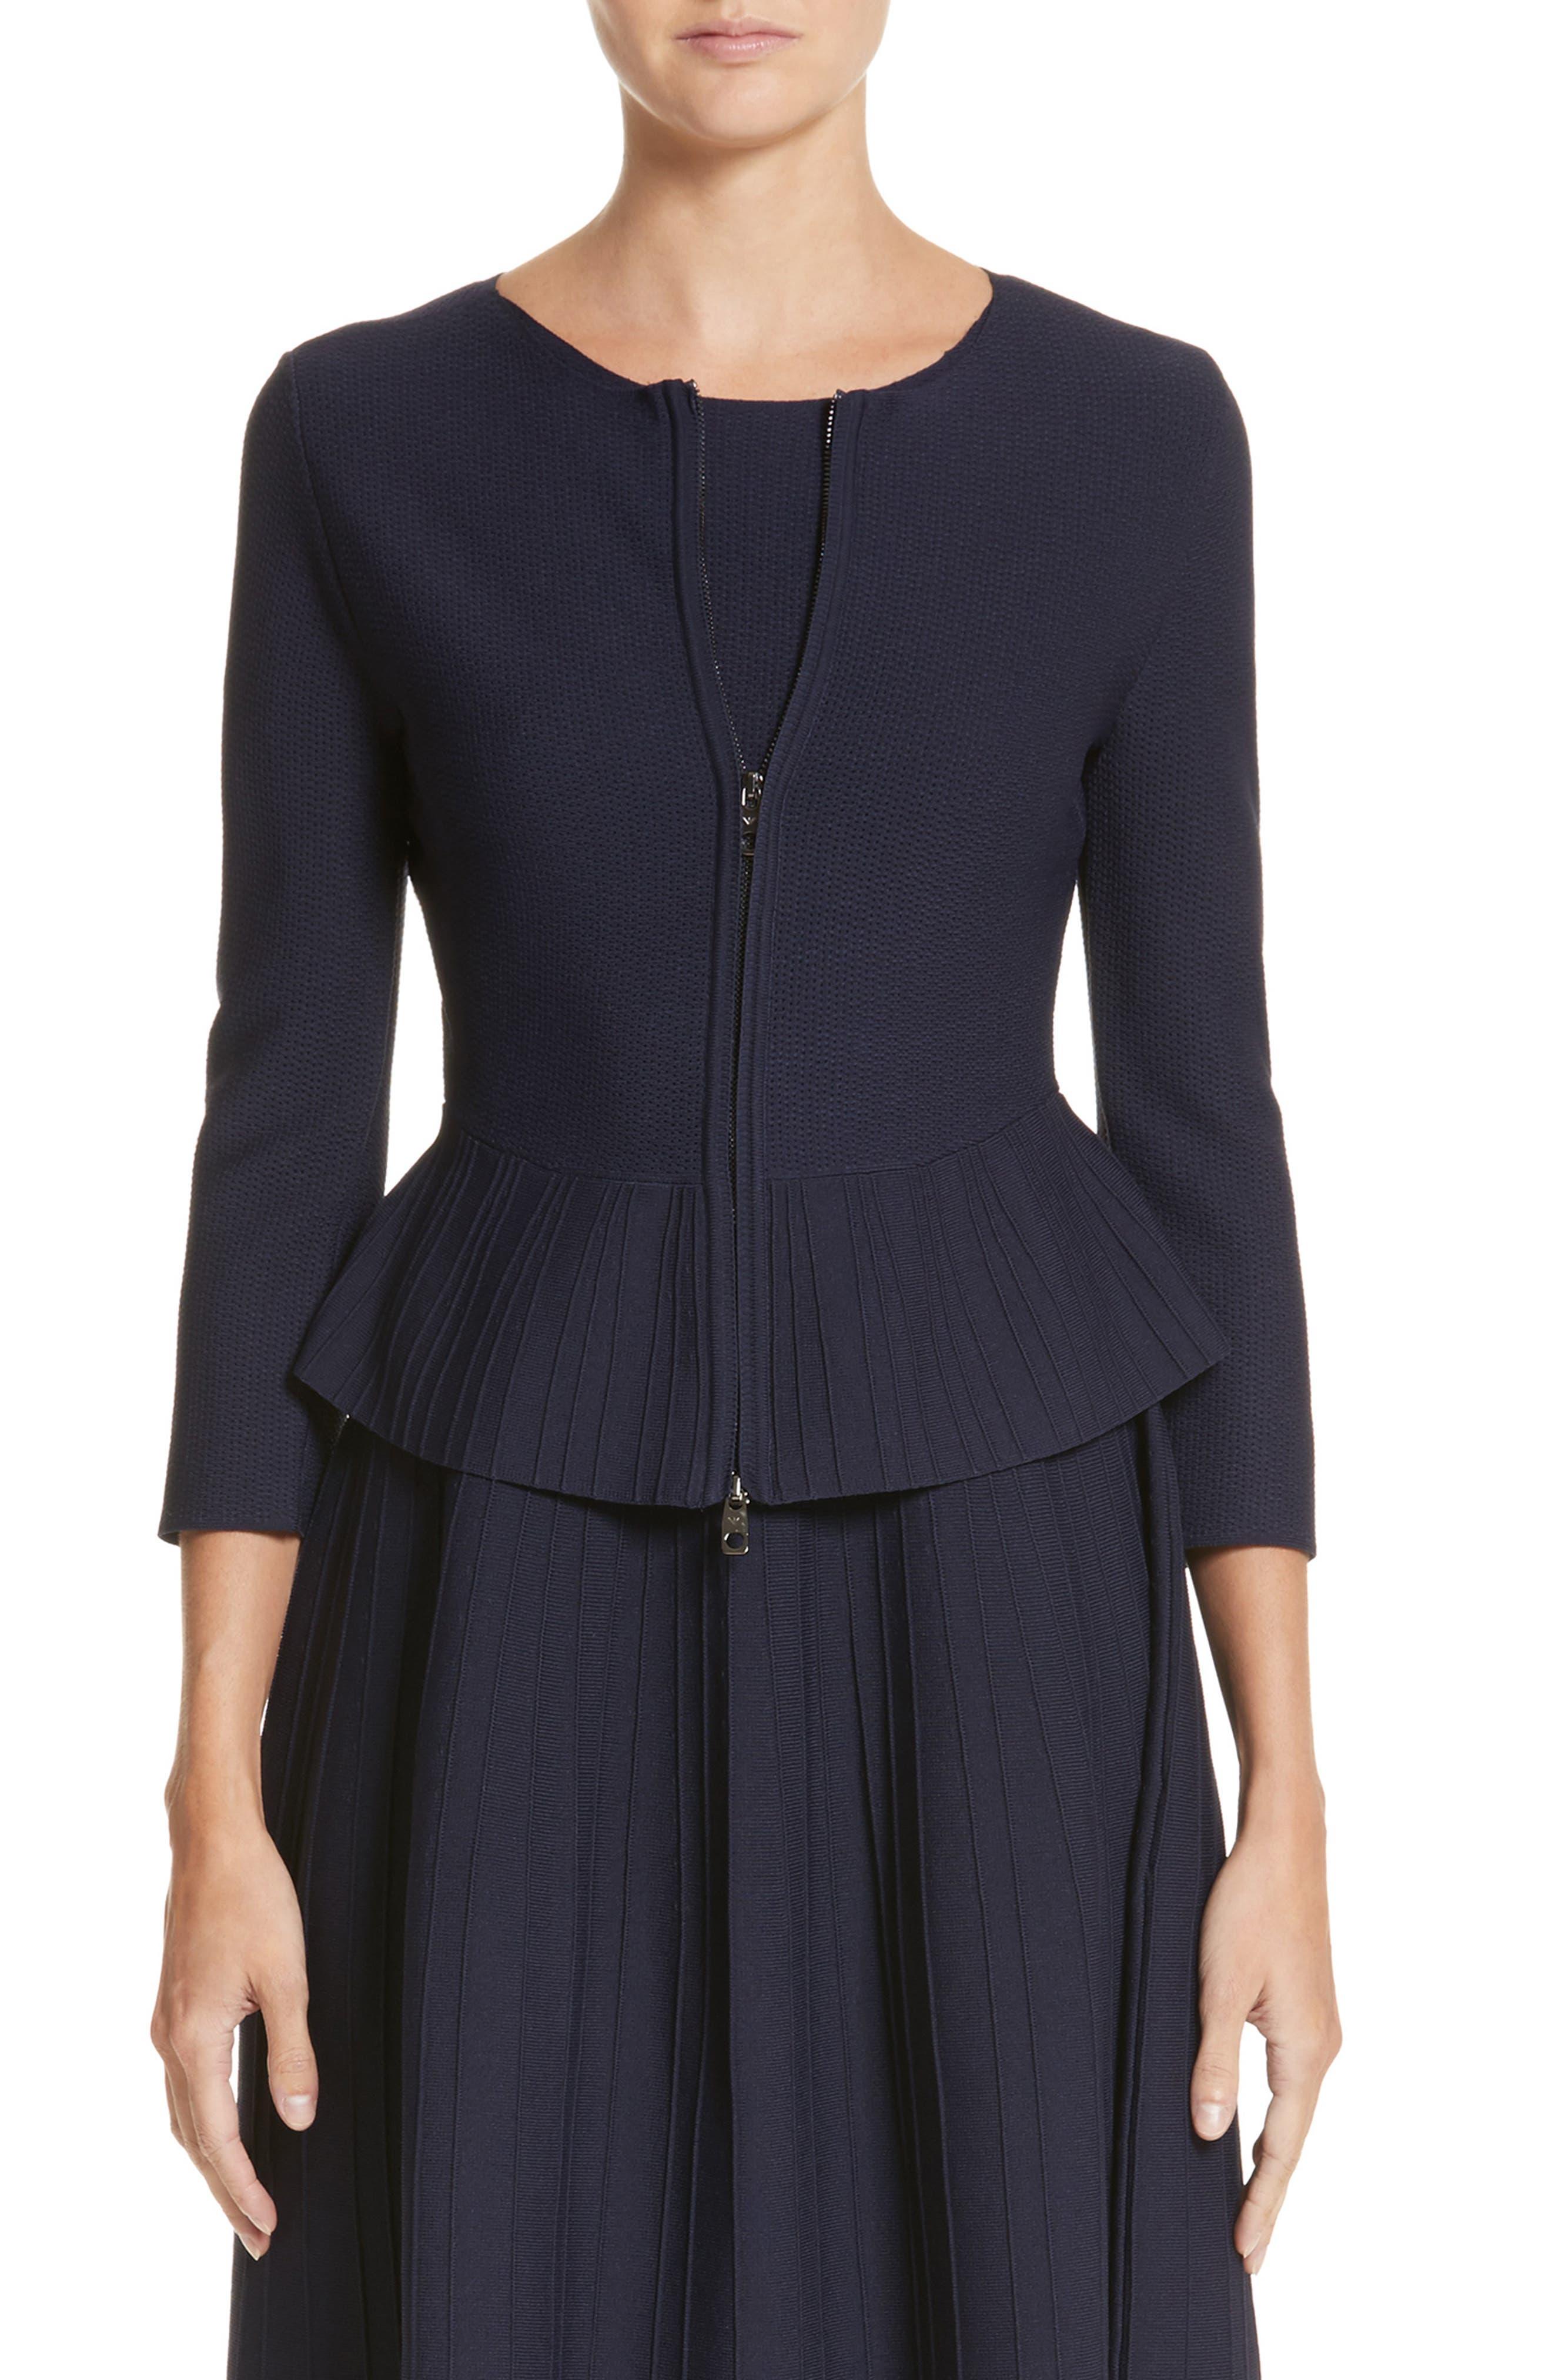 Emporio Armani Zip Front Peplum Knit Jacket